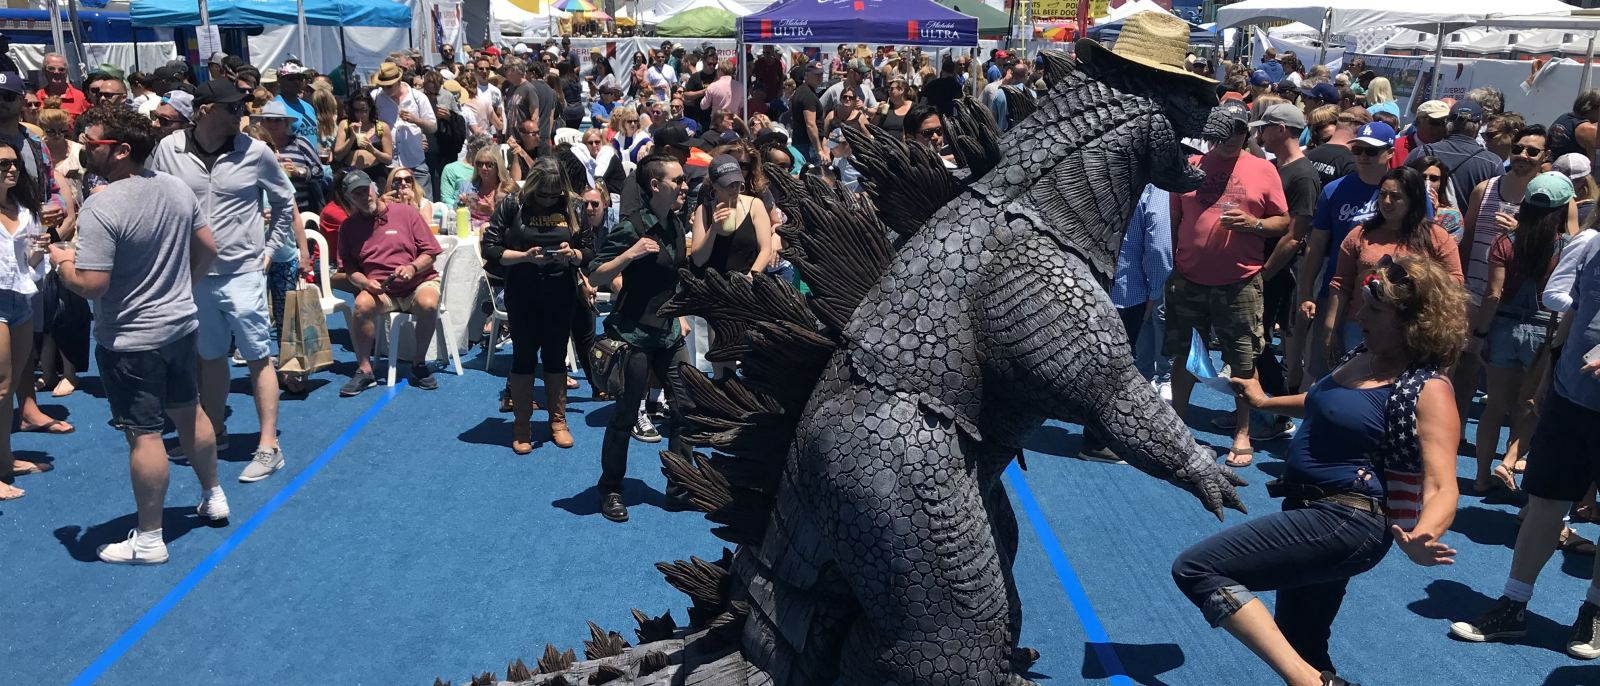 Godzilla dancing at Fiesta Hermosa